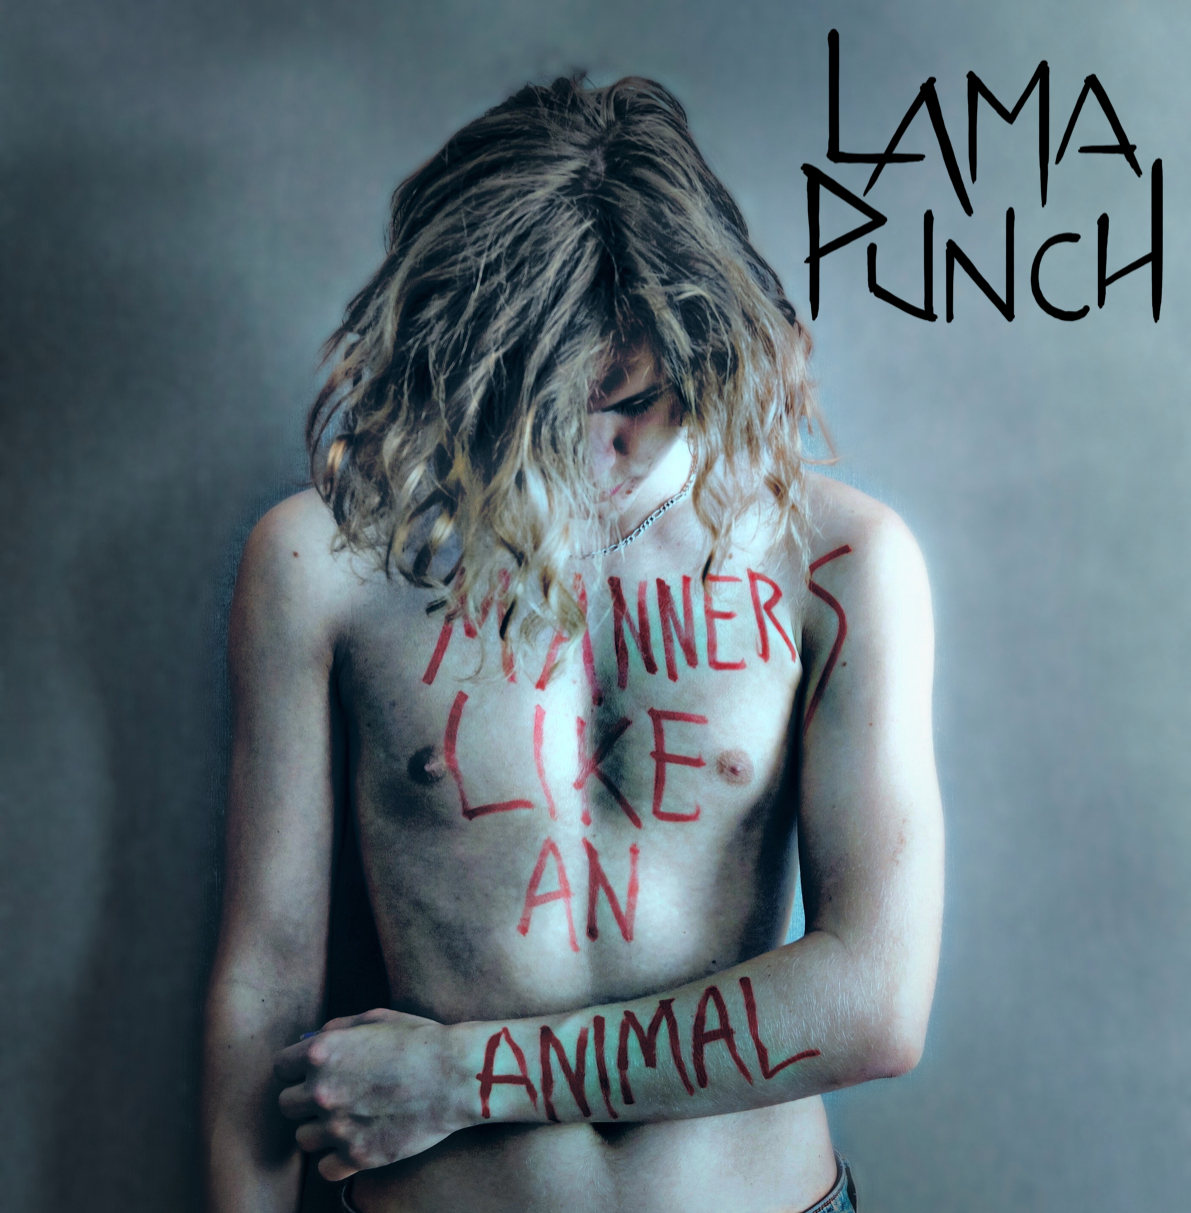 LamaPunch Manners Like An Animal konvolut2